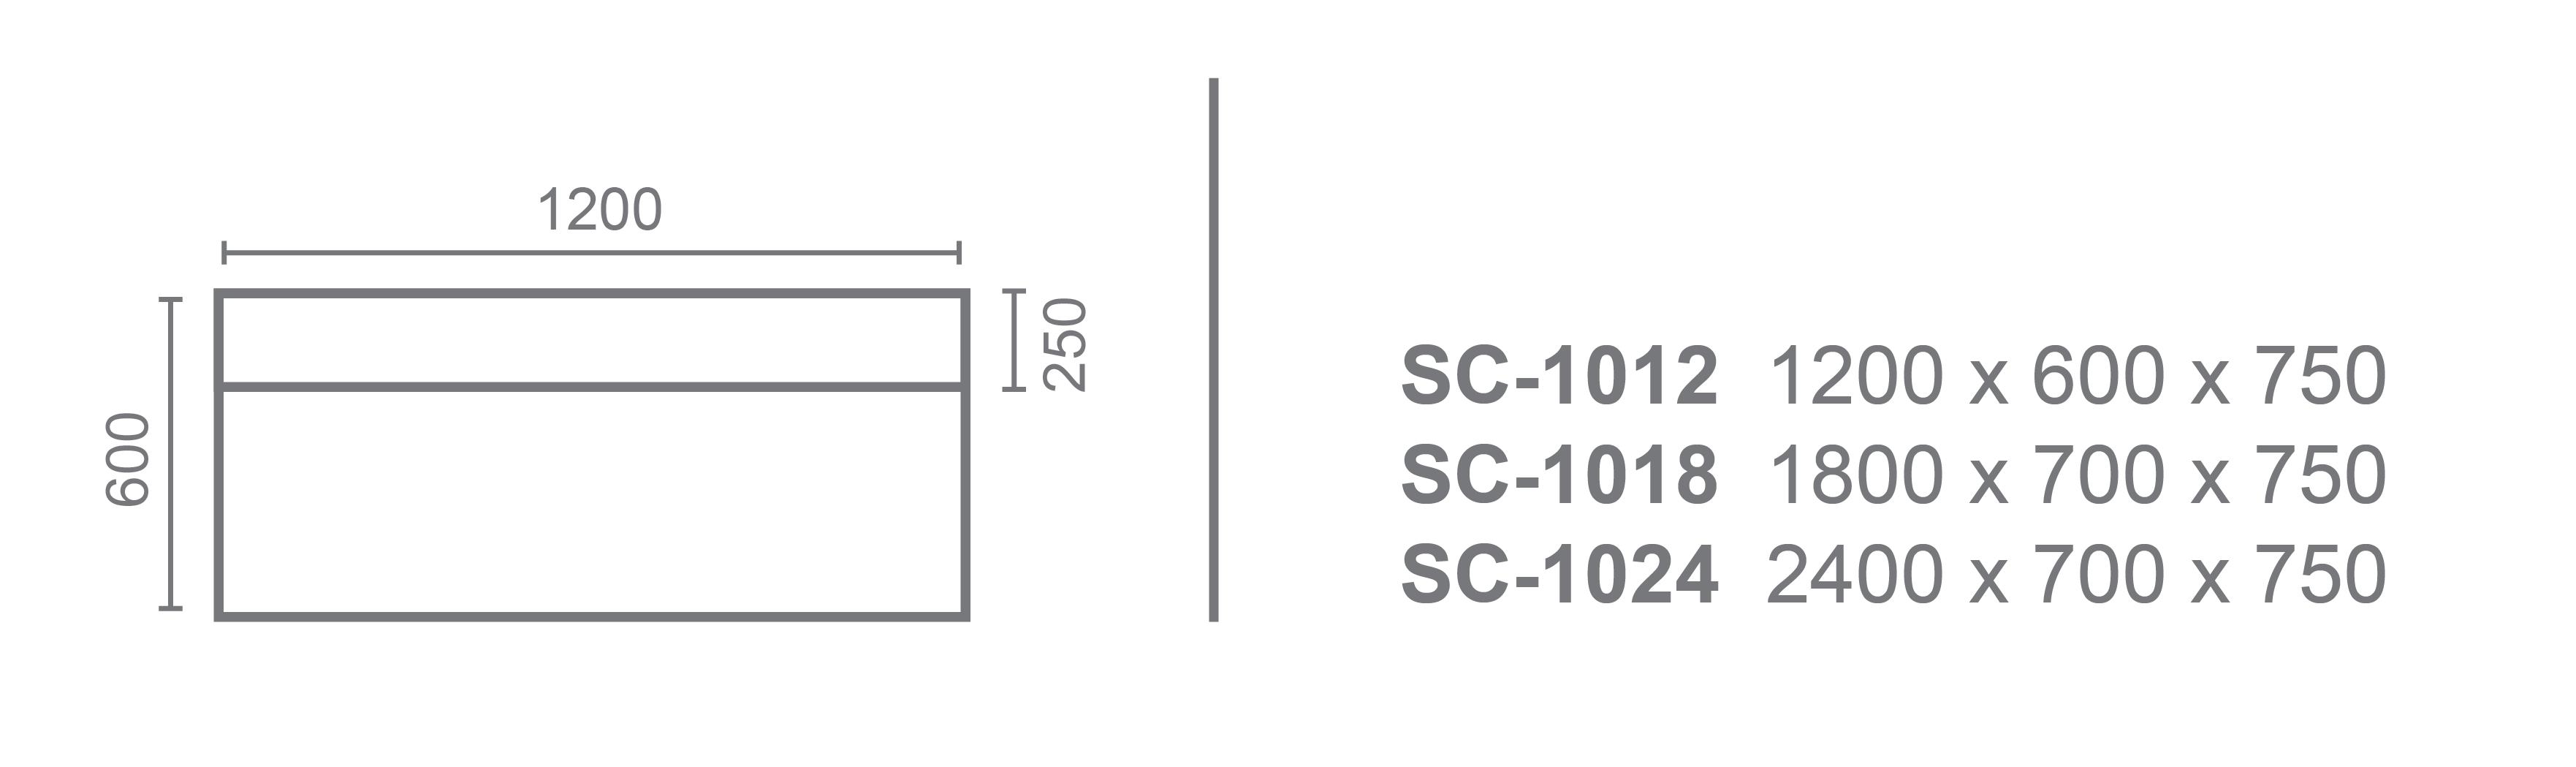 SC-1012